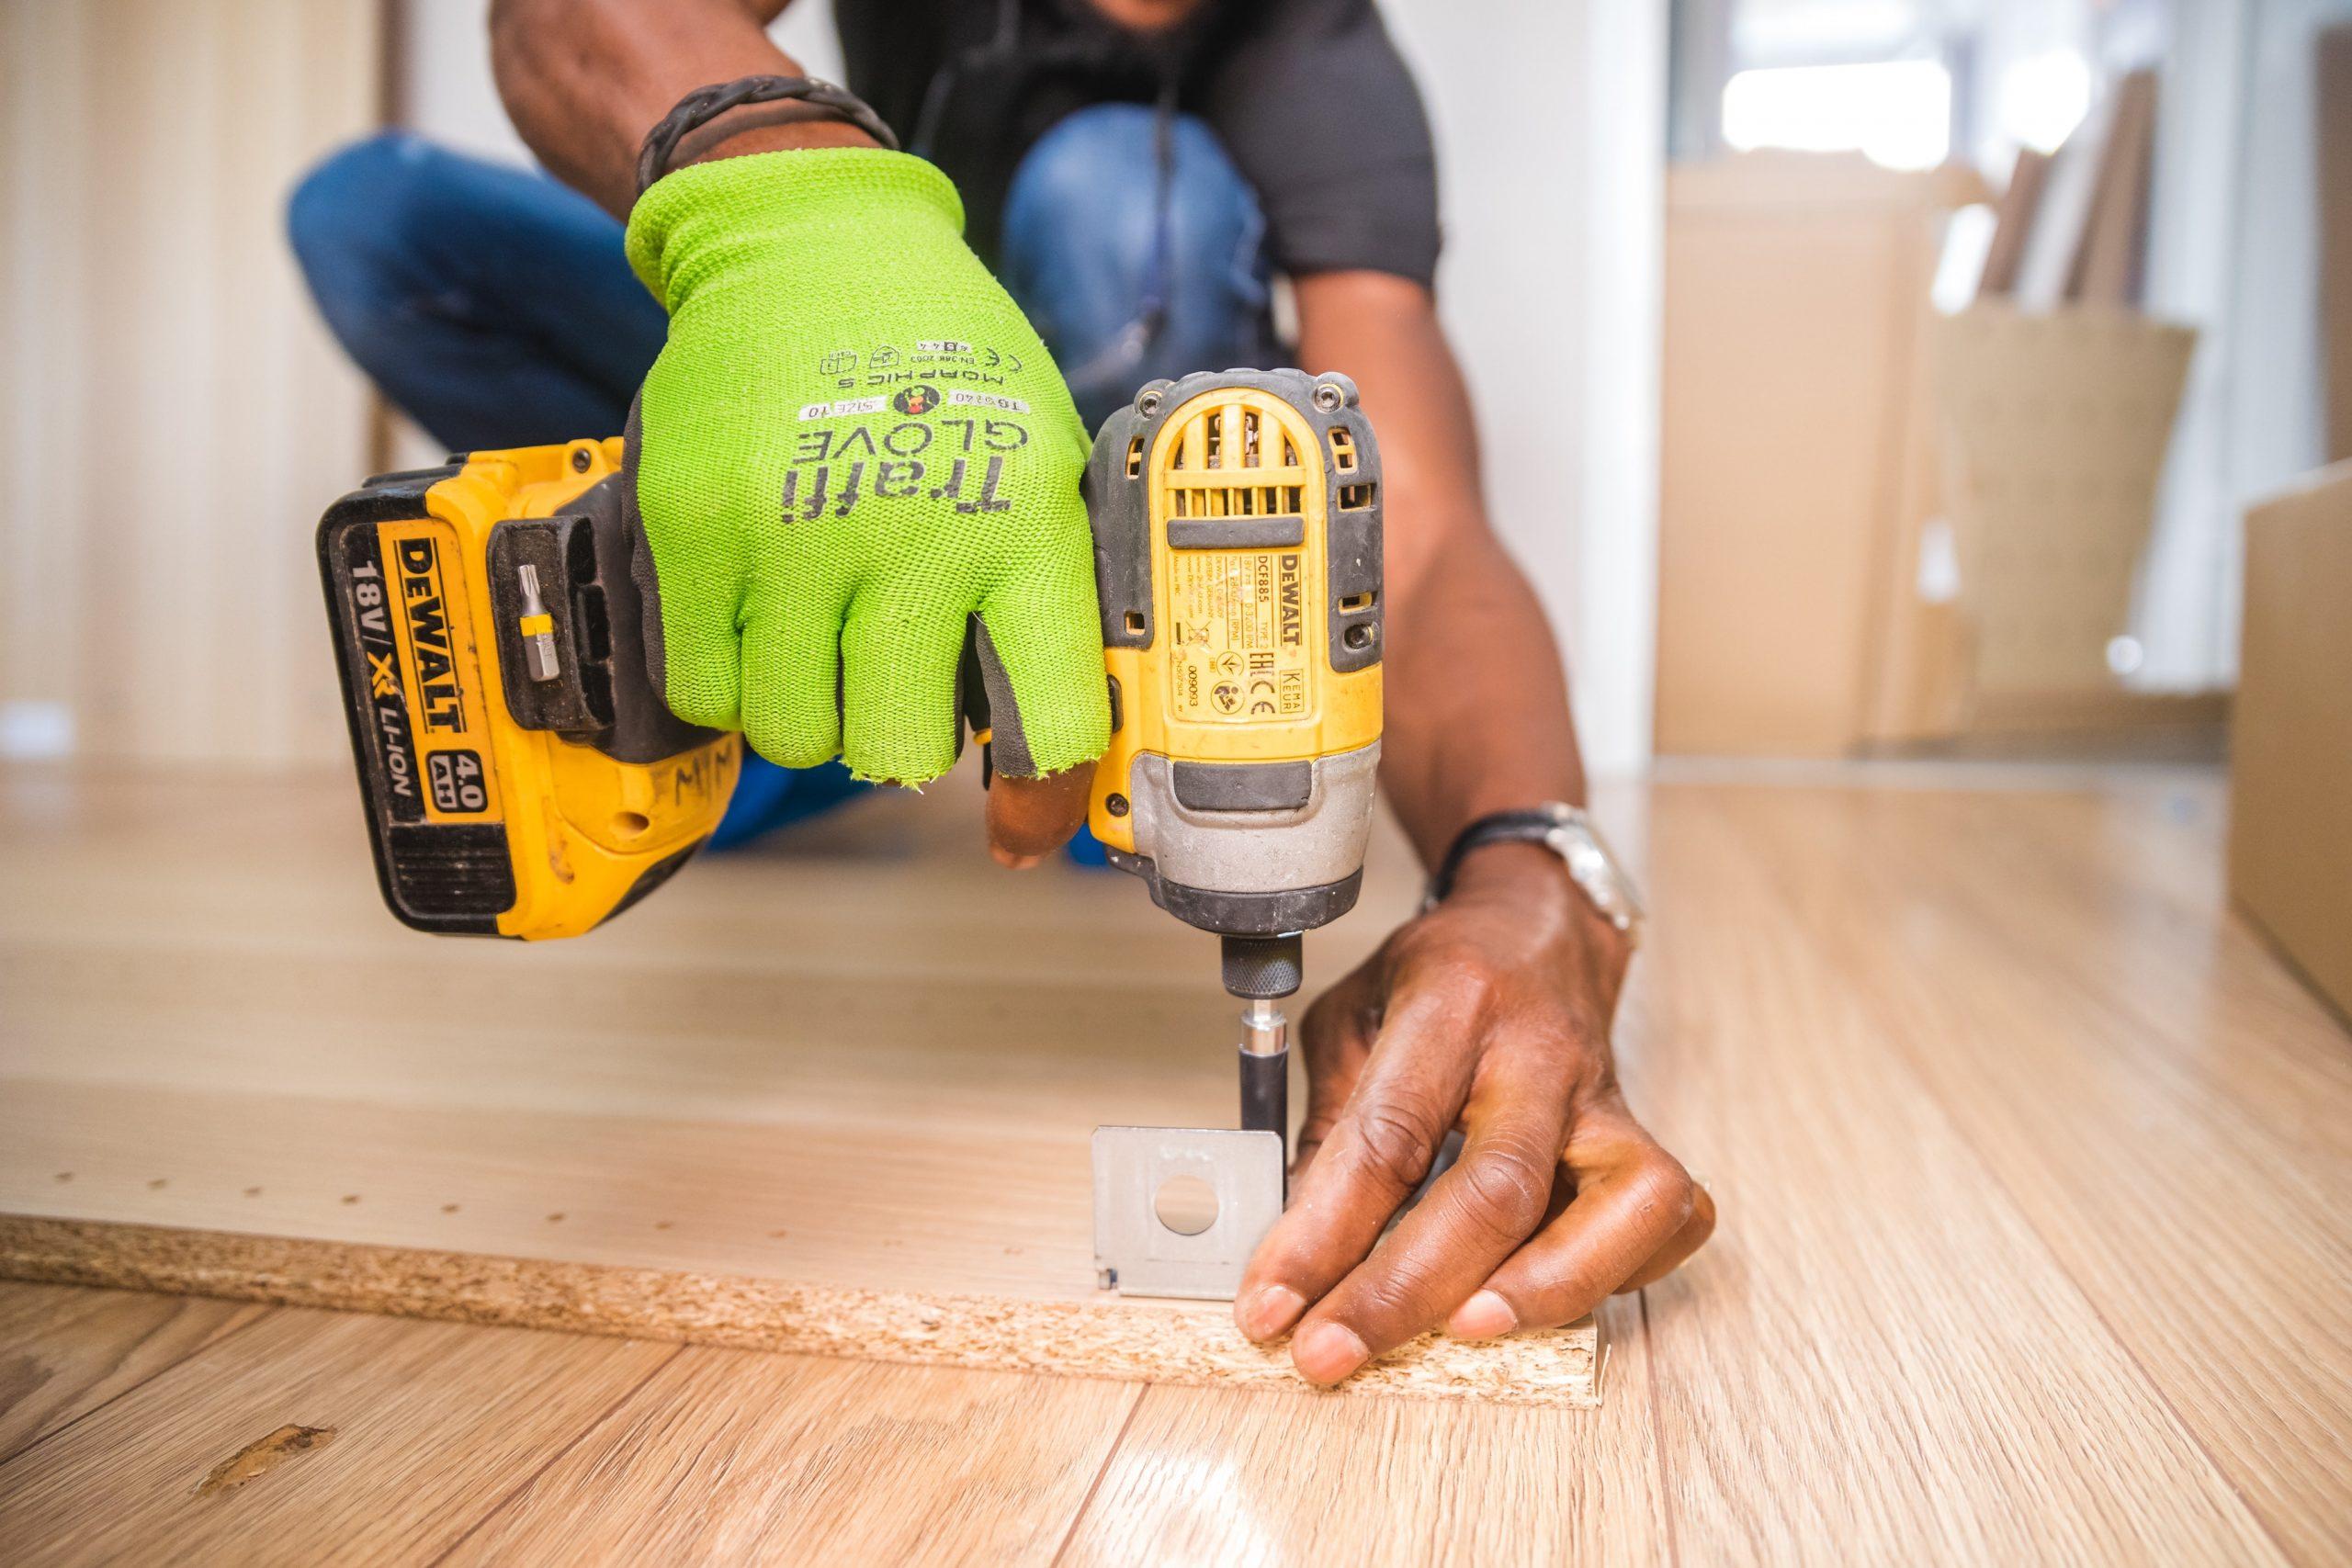 Commercial Handyman Installing Hardware